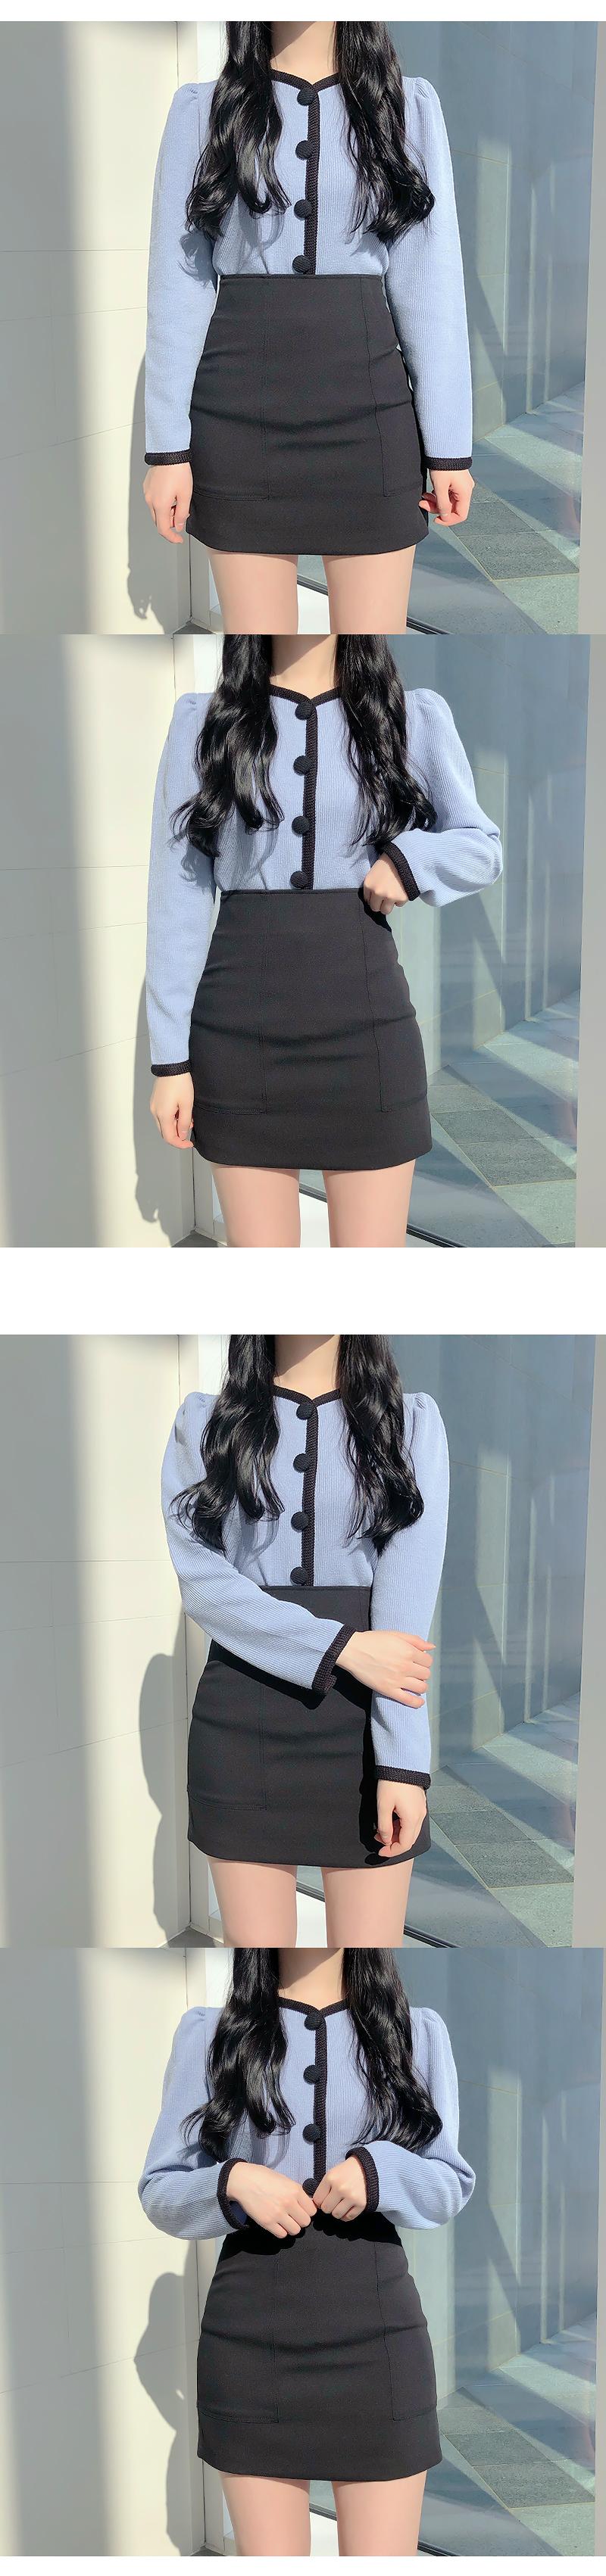 Jens incision miniskirt